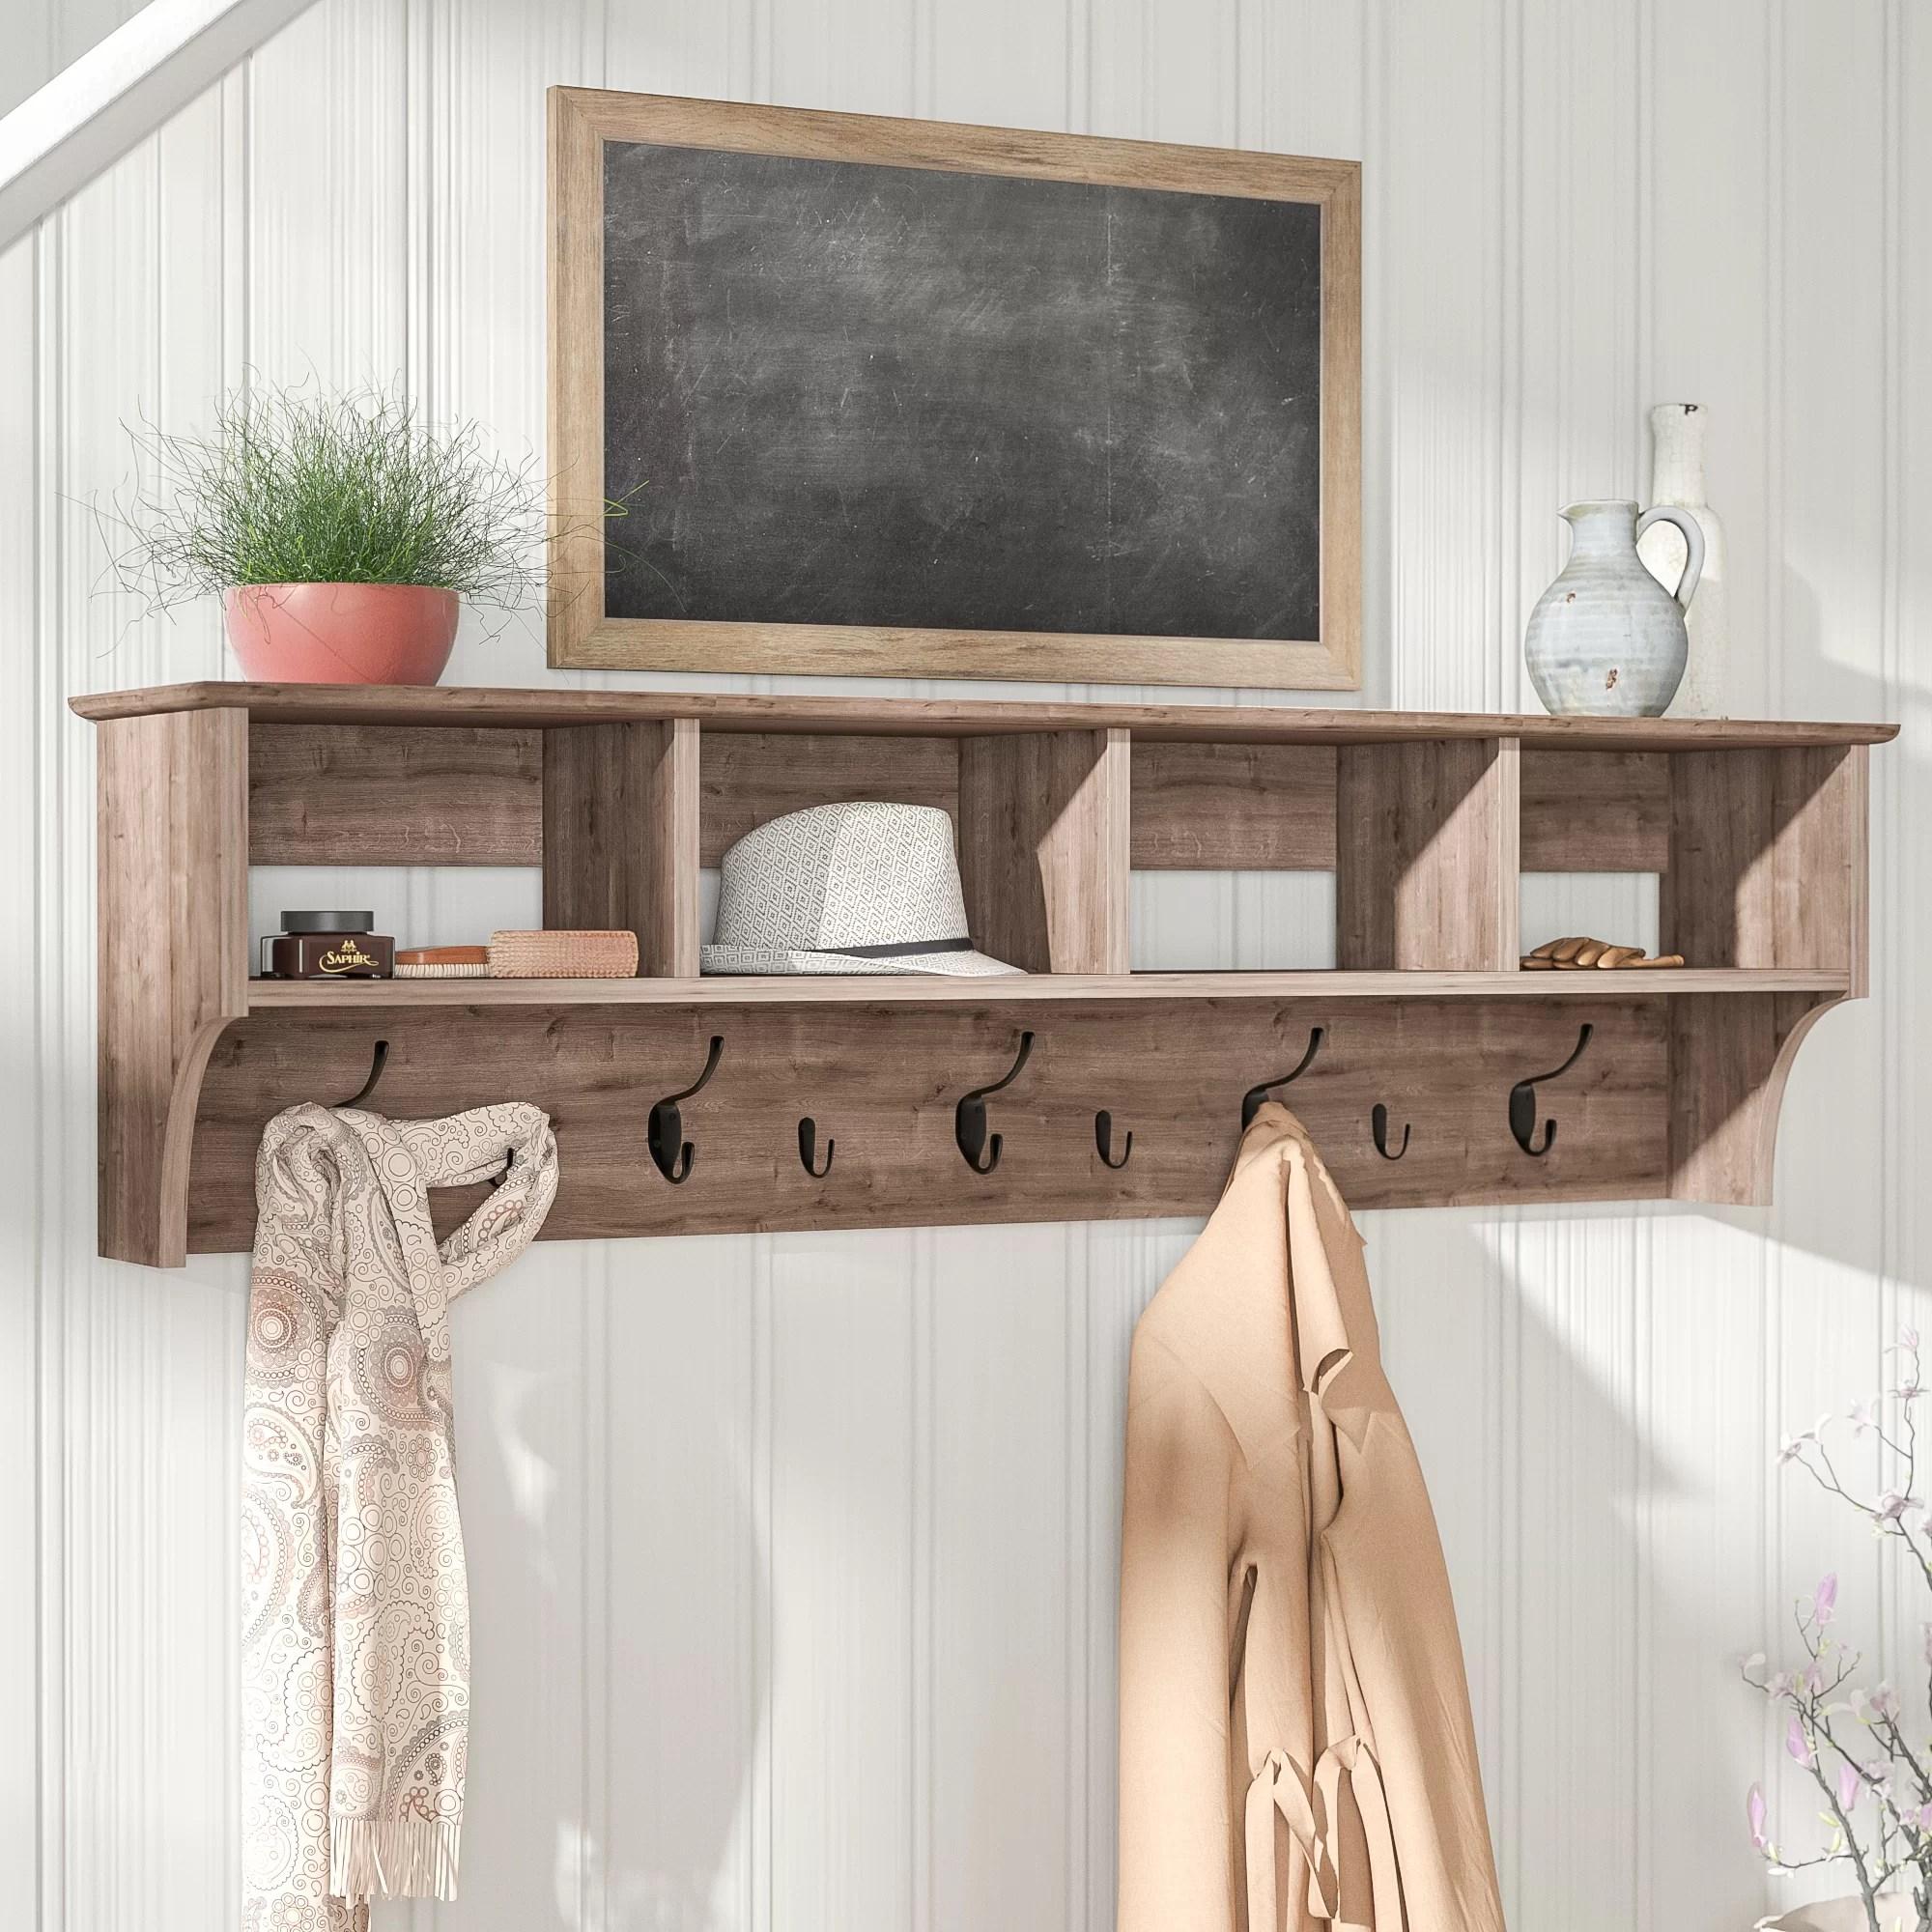 manzanola wall mounted coat rack